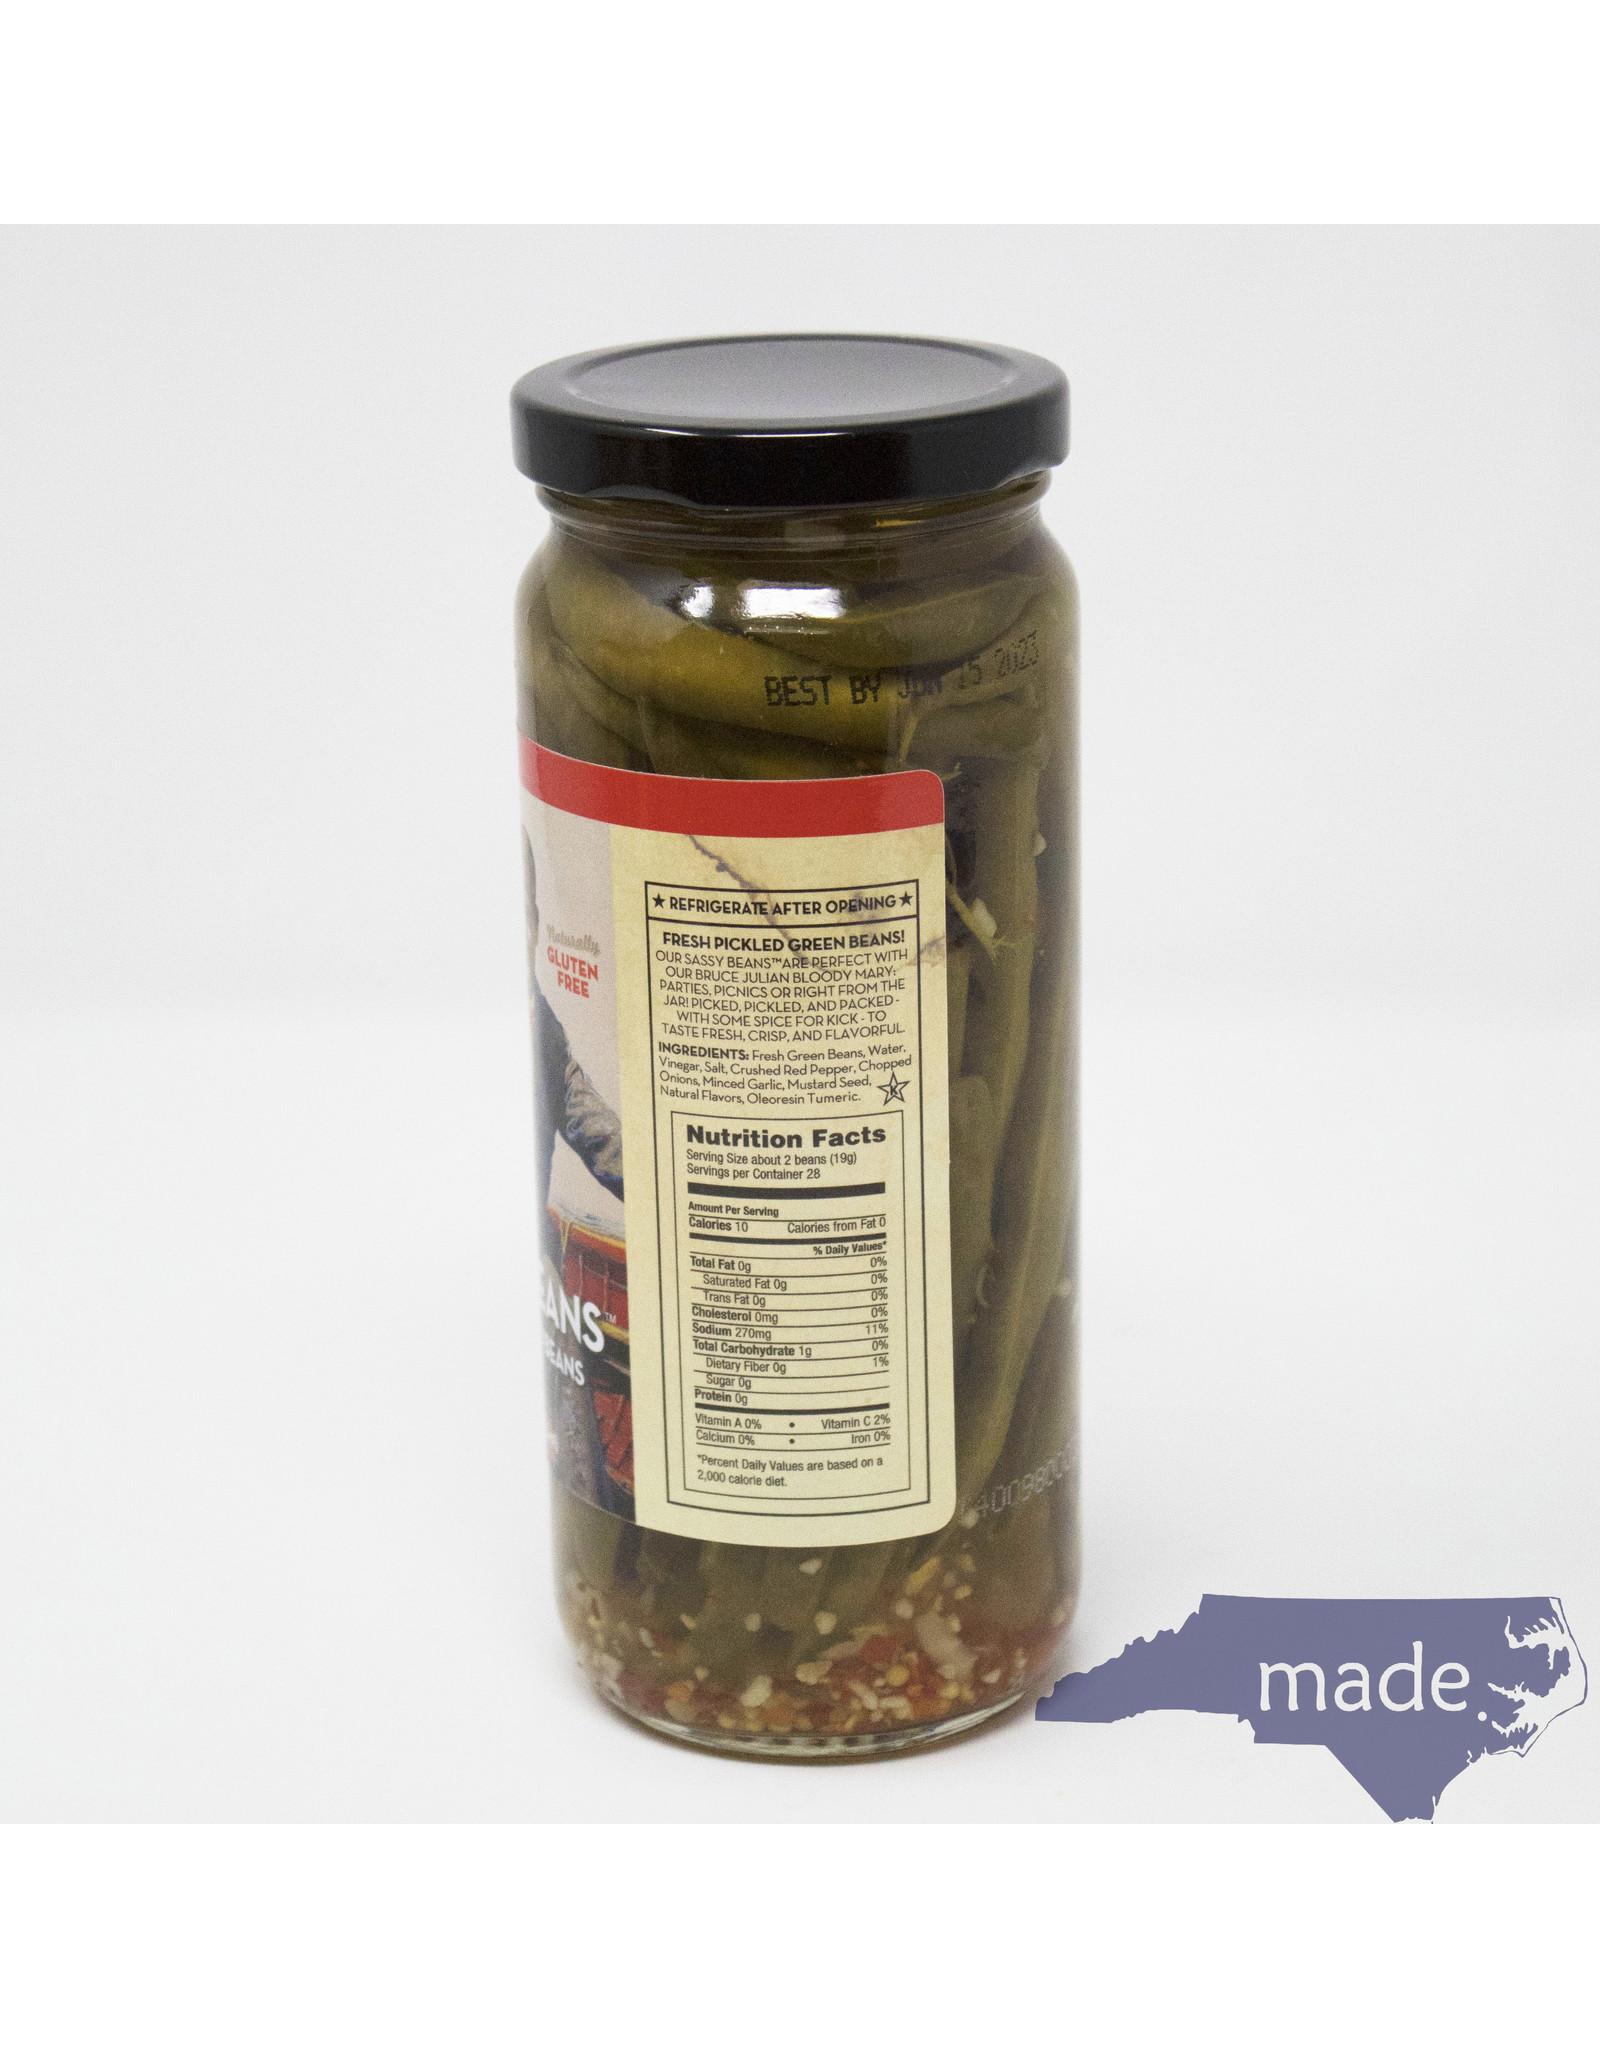 Bruce Julian Heritage Foods Sassy Beans 16 oz. - Bruce Julian